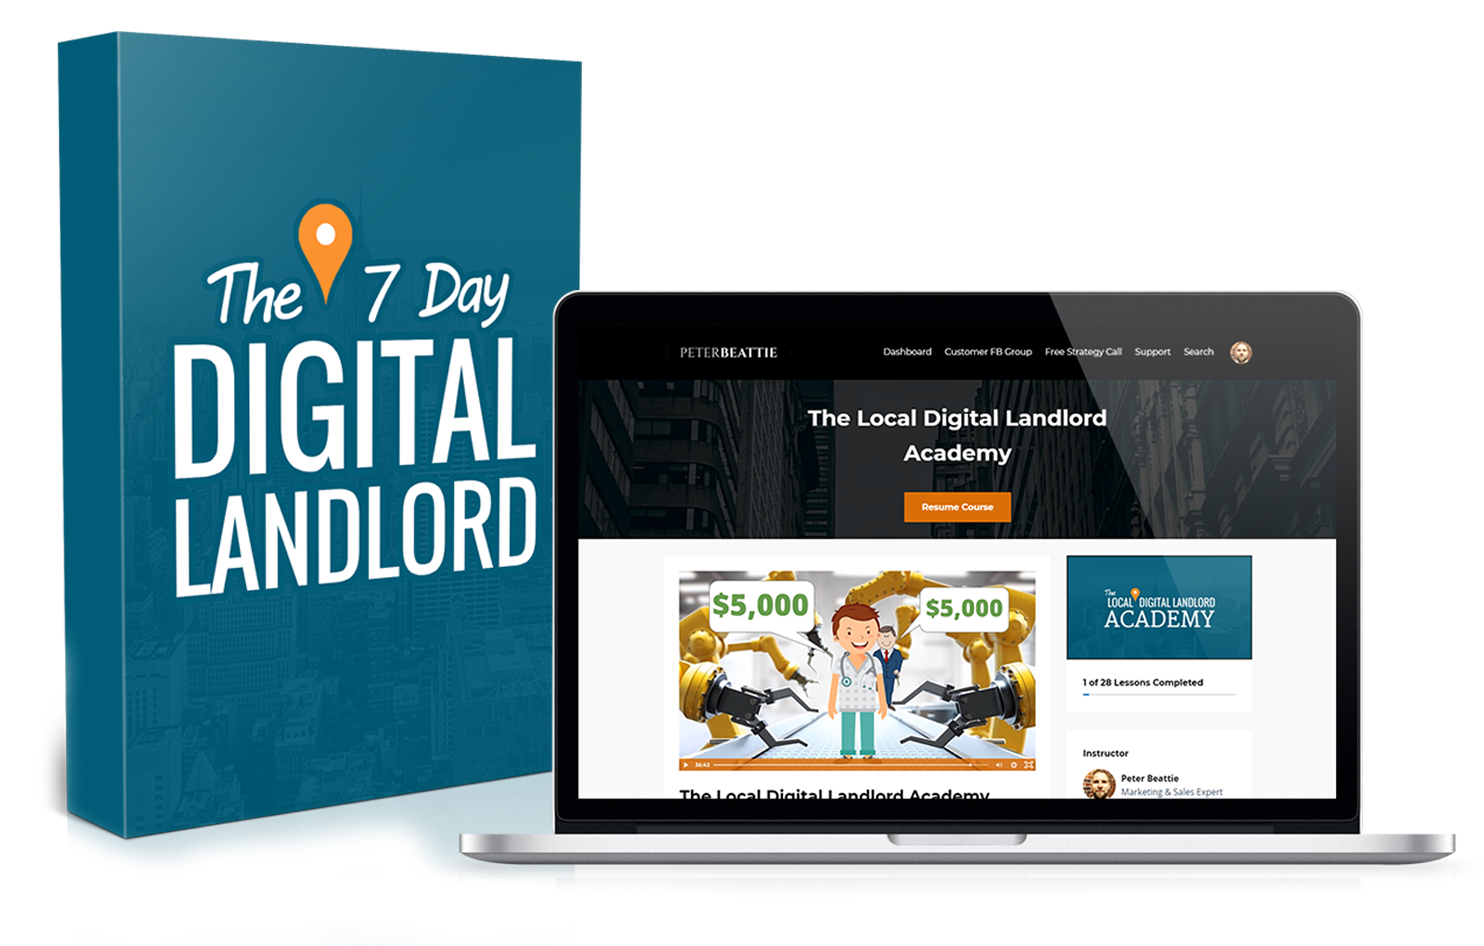 The Digital Landlord Academy